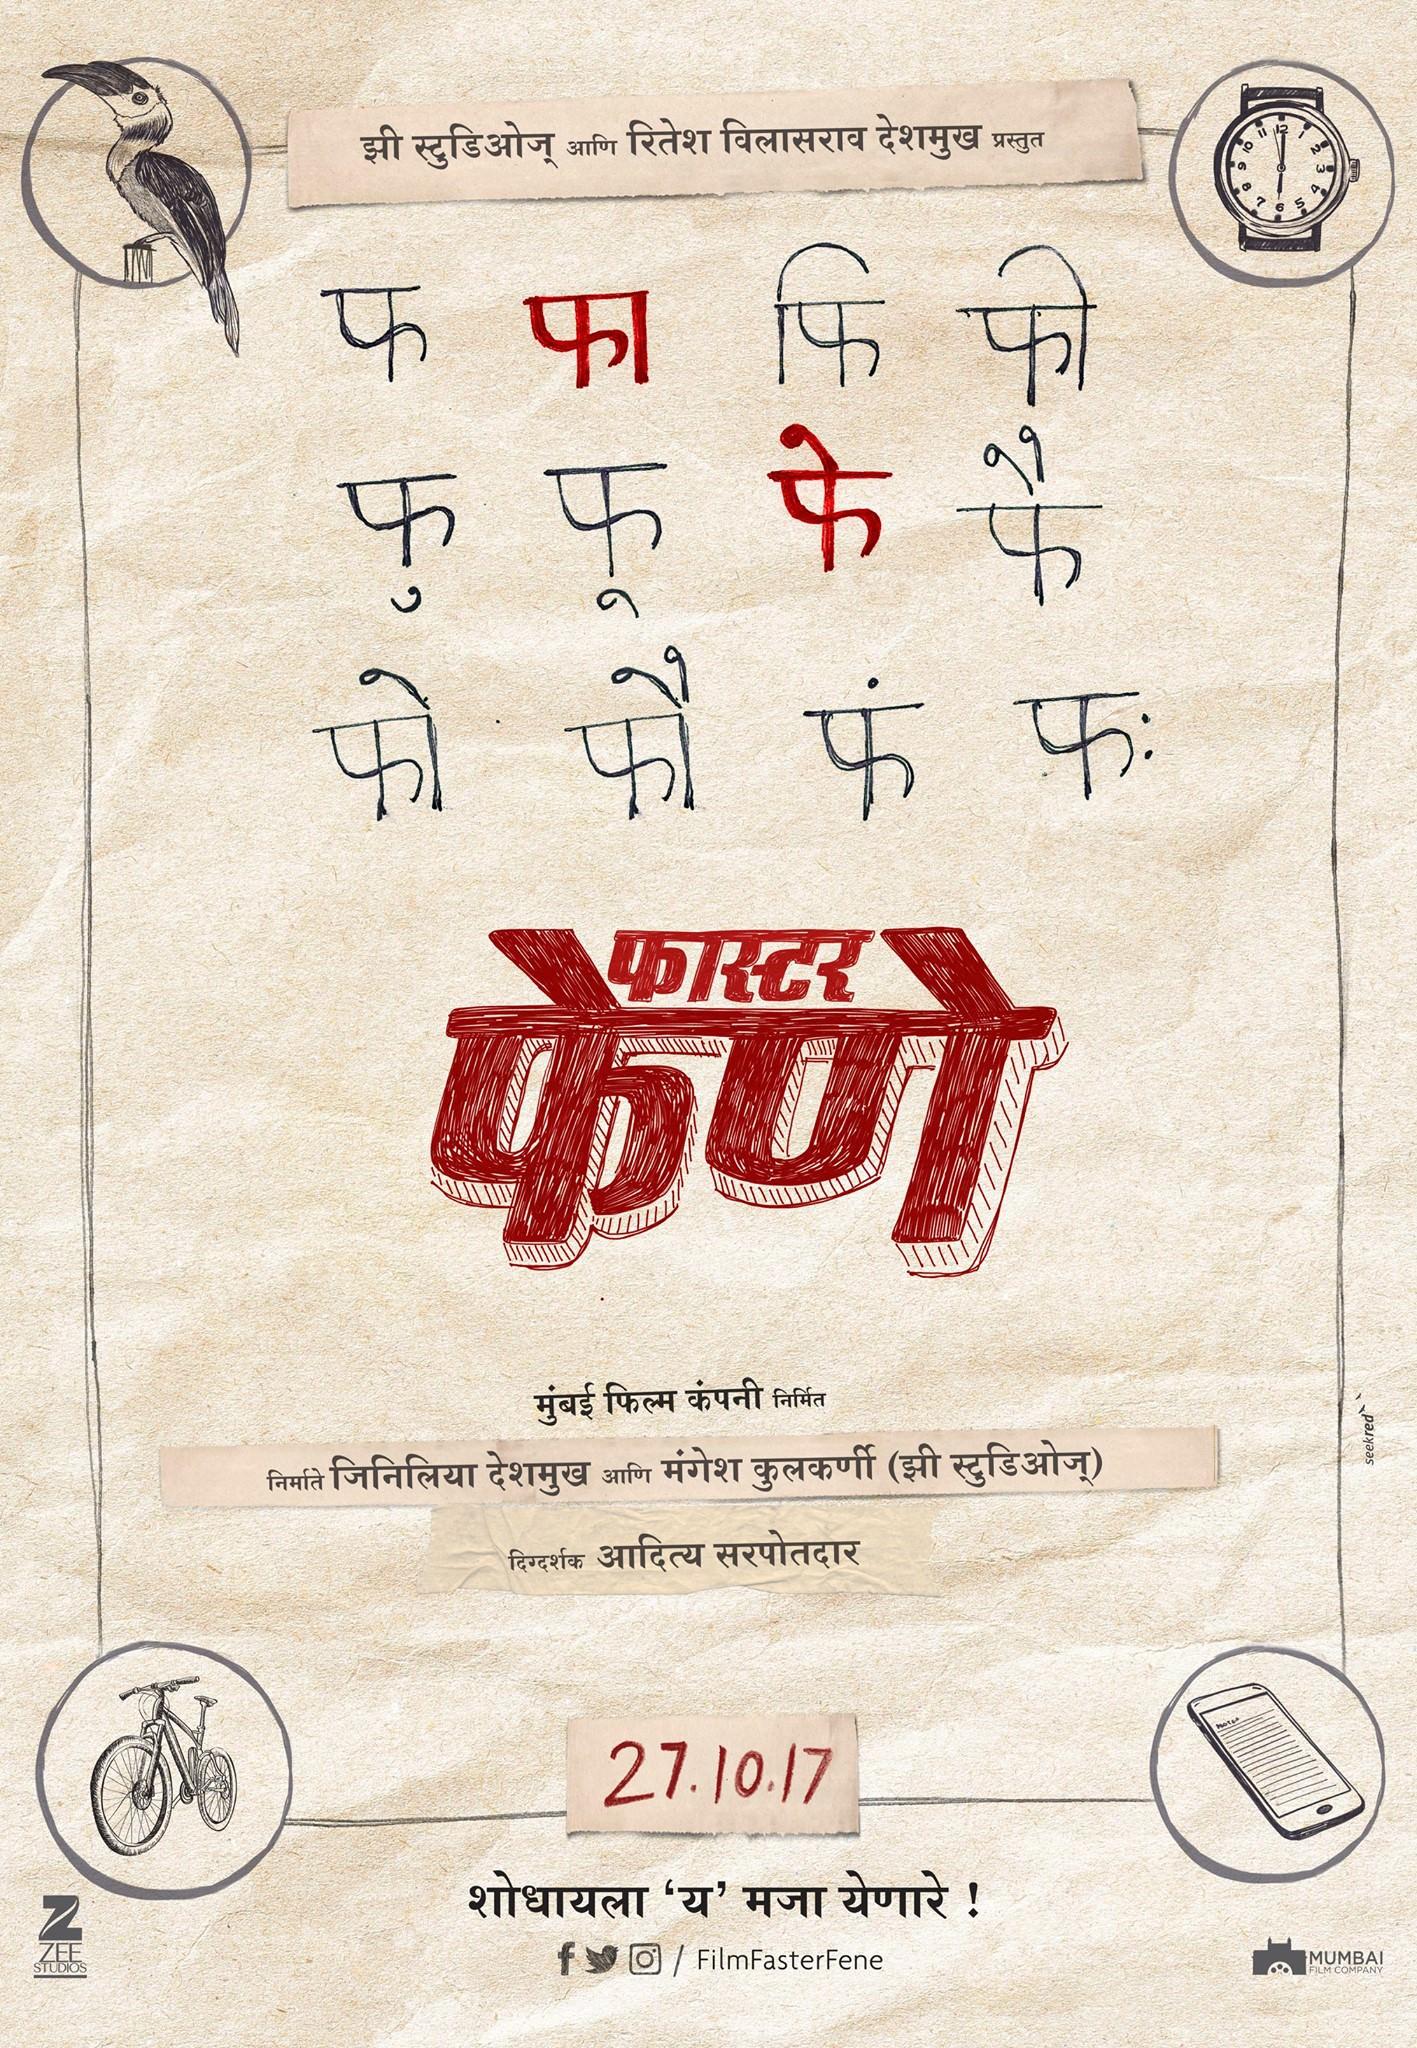 Shutter marathi movie download 300mb / Masss 2015 tamil